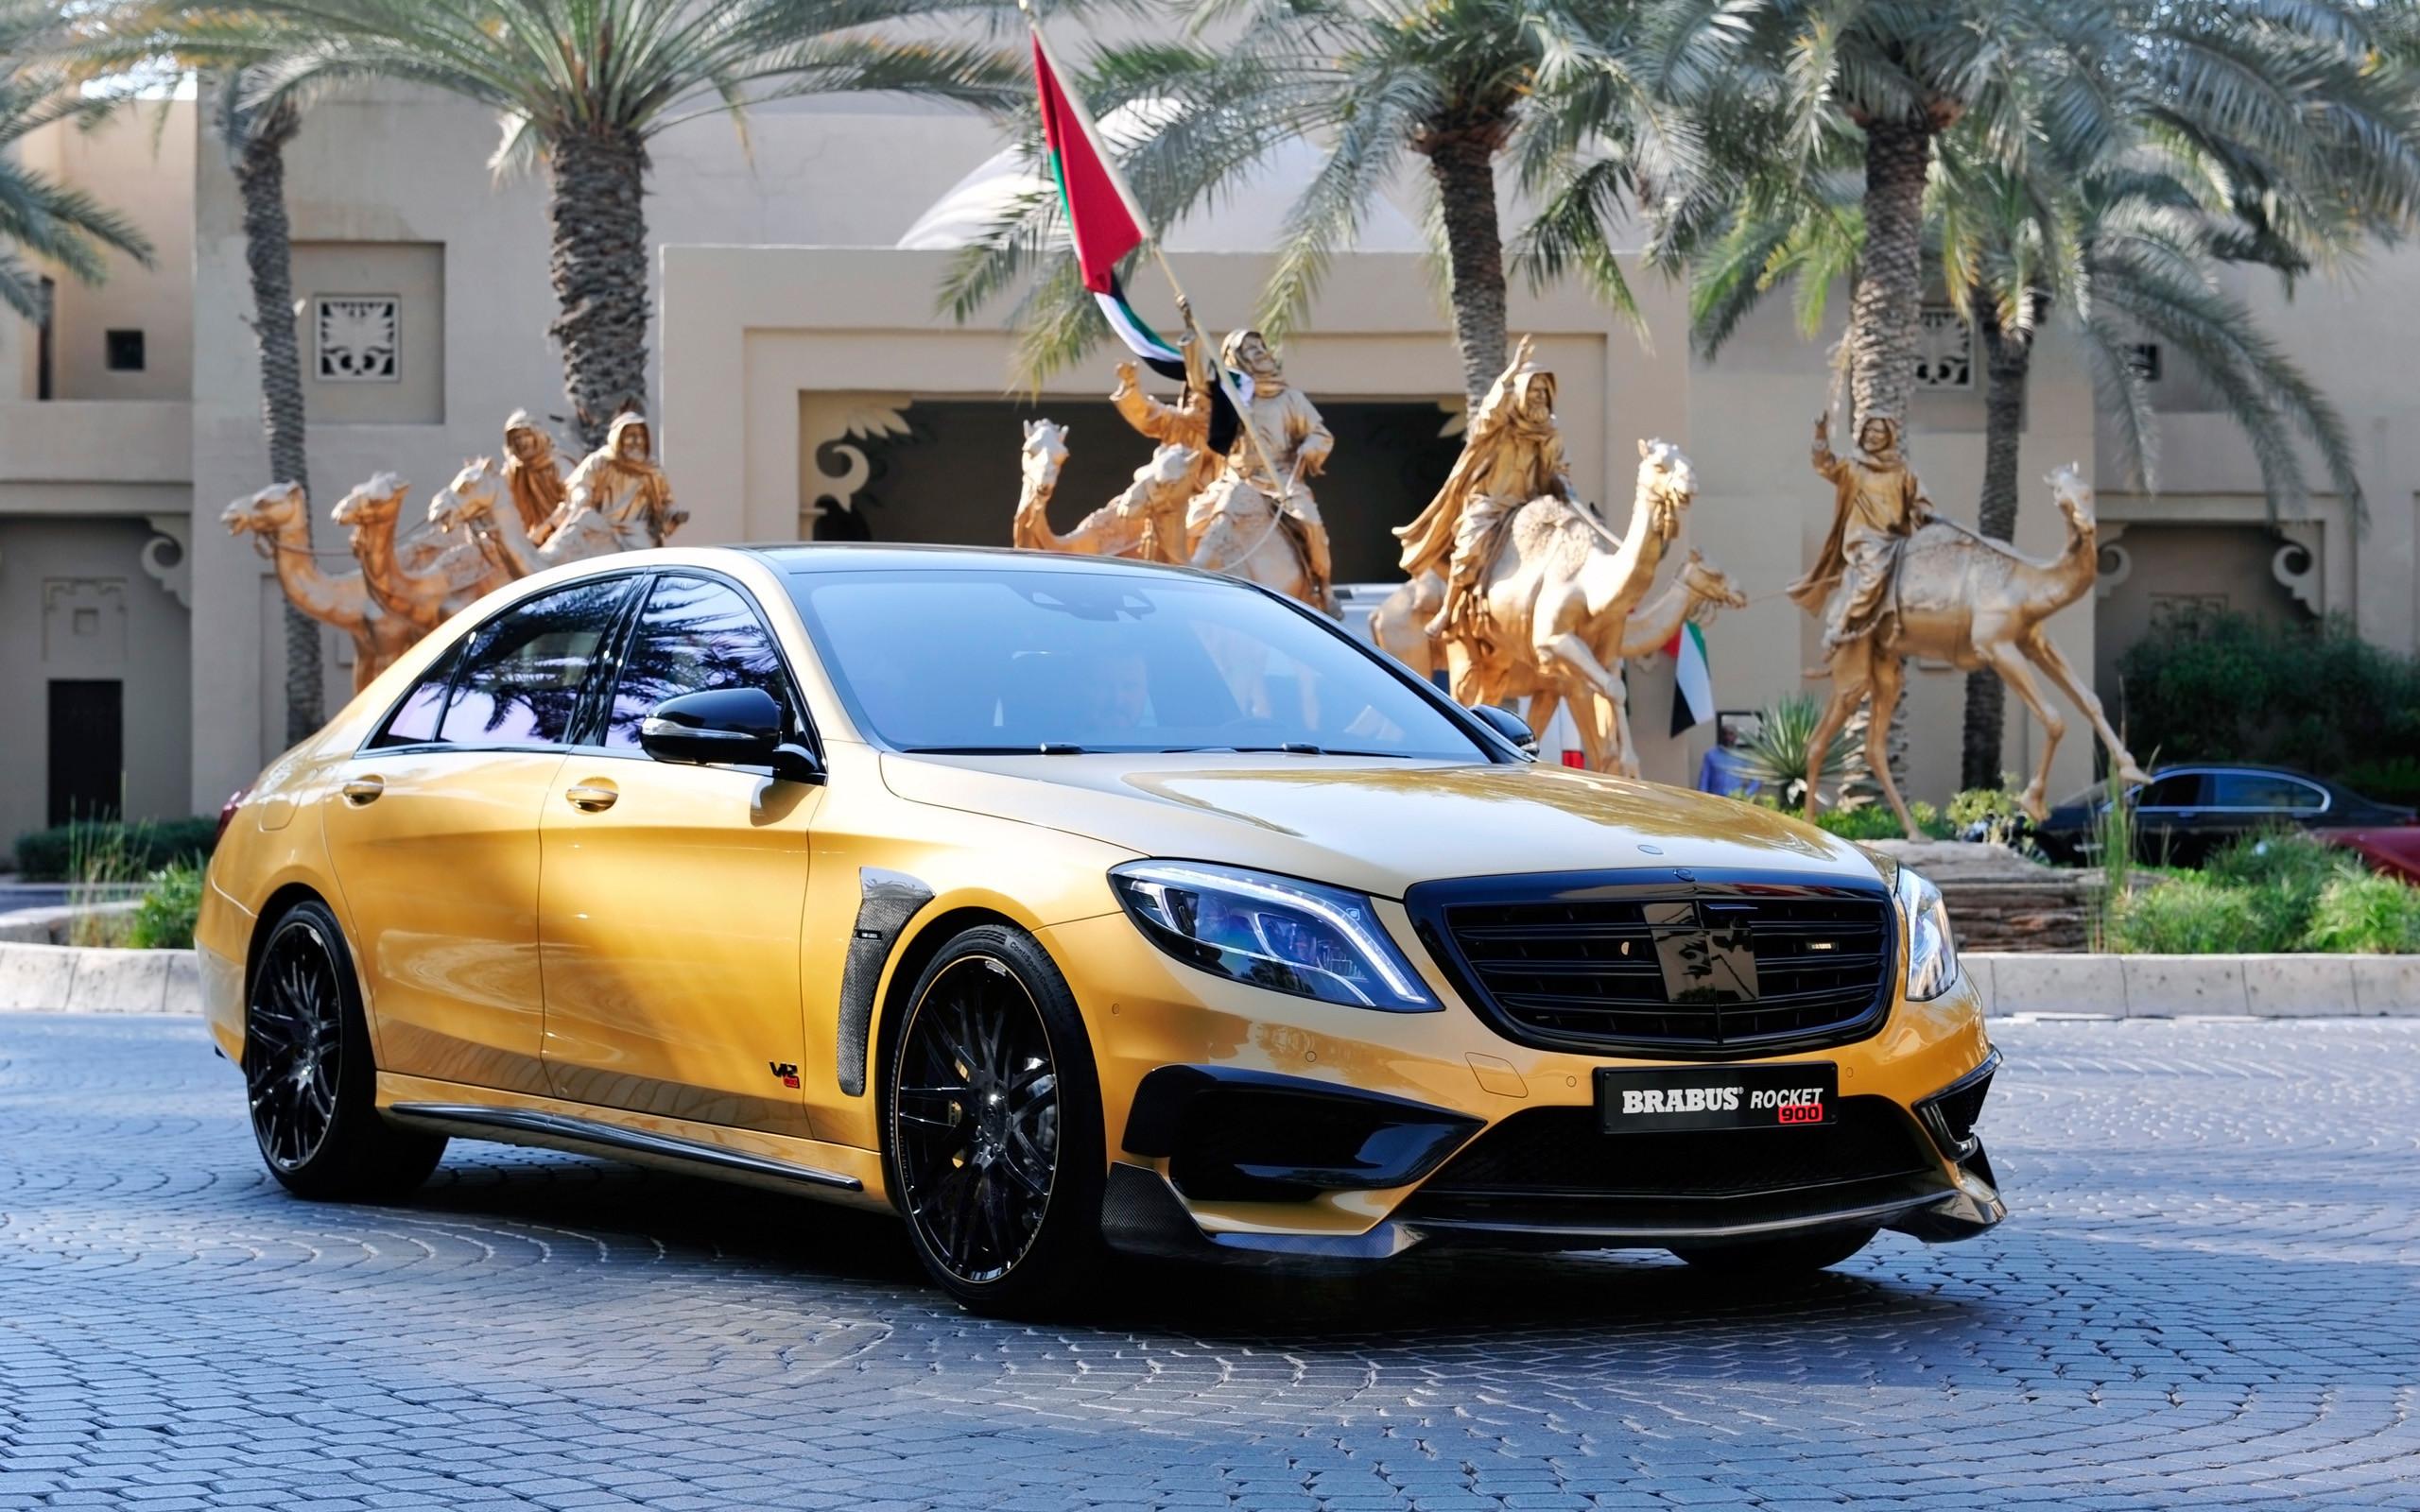 Brabus Mercedes Benz S65 Rocket 900 Desert Gold